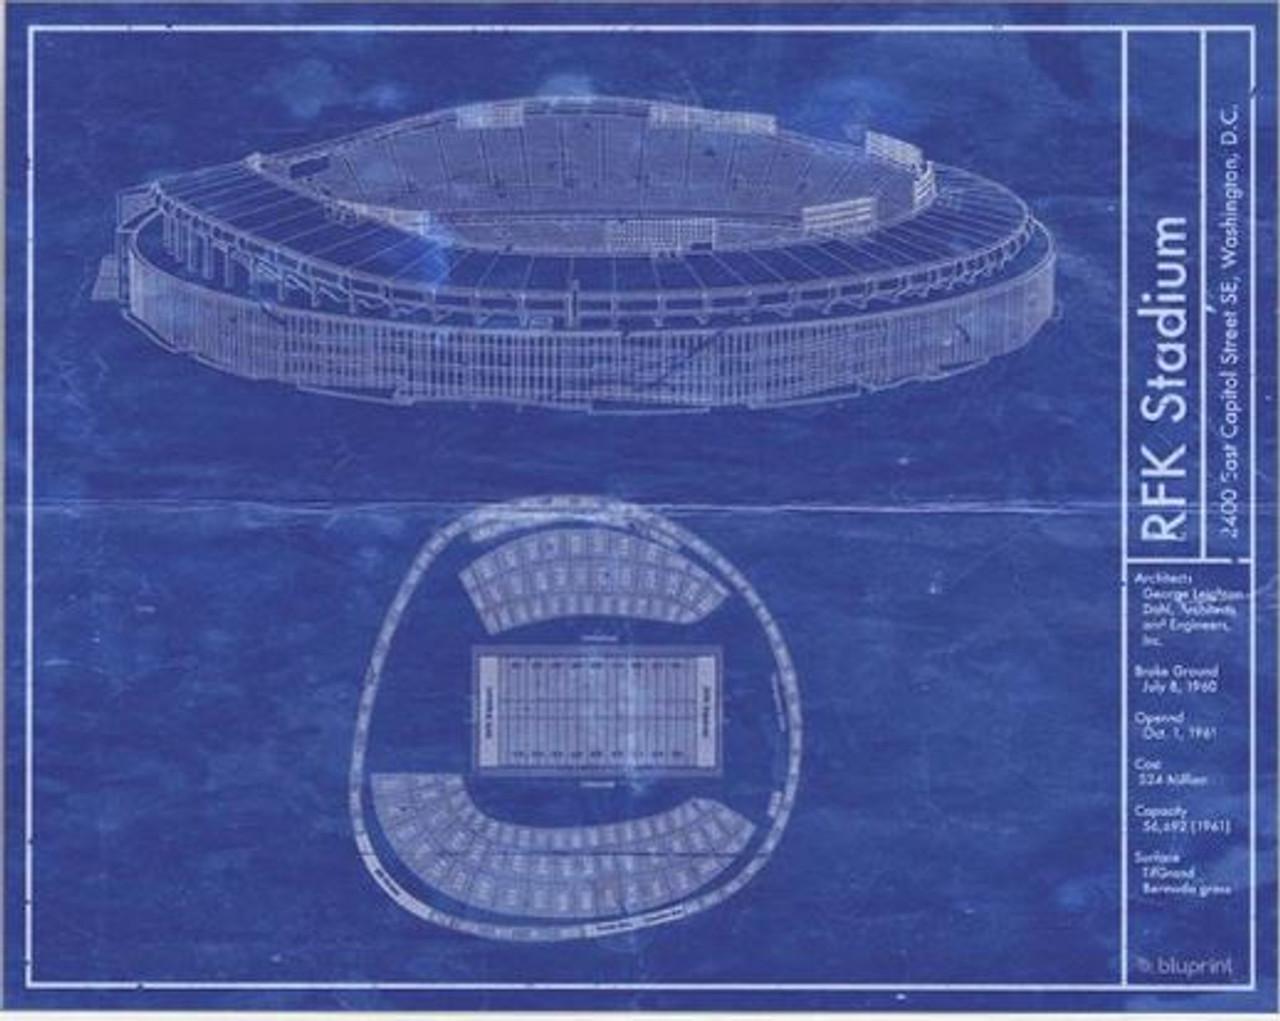 RFK Stadium - Washington Redskins Blueprint Poster